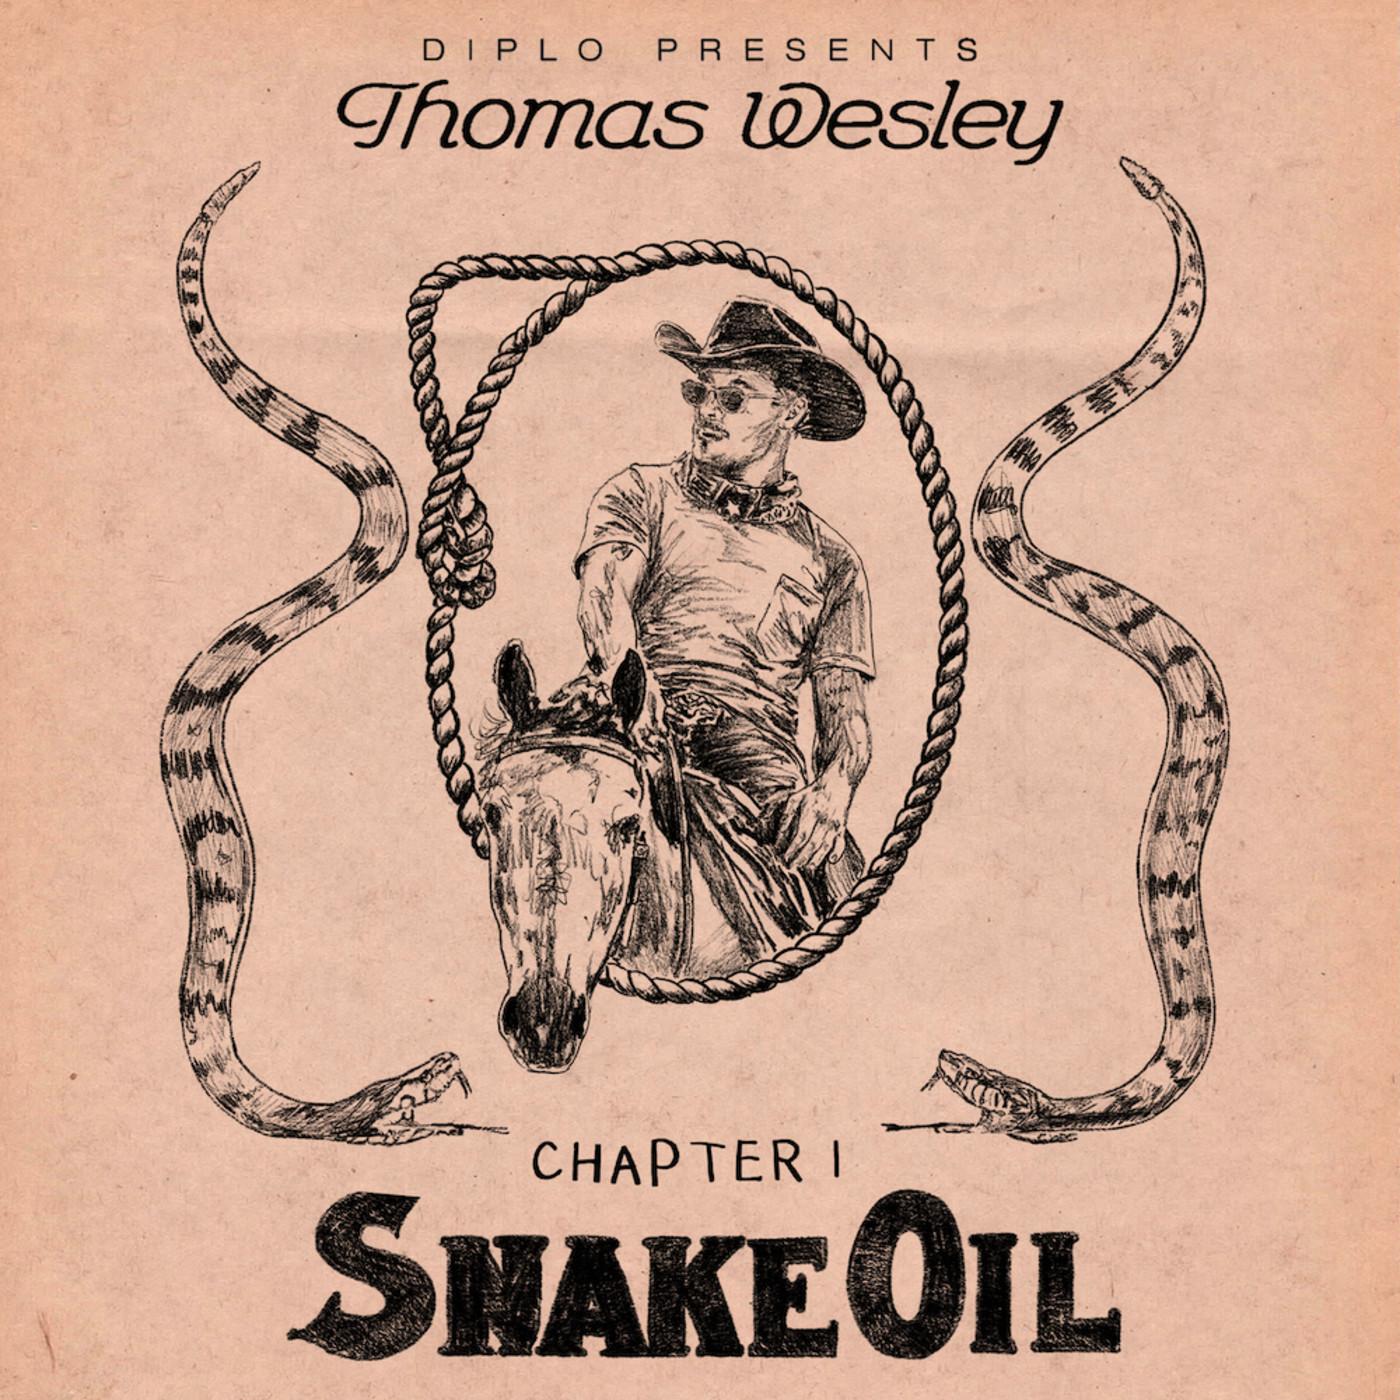 "https://www.youredm.com/ ""srcset ="" https://www.youredm.com/wp-content/uploads/2020/05/diplo-presents-thomas-wesley-chapter-1-snake-oil- stream.jpg 1400w, https://www.youredm.com/wp-content/uploads/2020/05/diplo-presents-thomas-wesley-chapter-1-snake-oil-stream-1024x1024.jpg 1024w, https: //www.youredm.com/wp-content/uploads/2020/05/diplo-presents-thomas-wesley-chapter-1-snake-oil-stream-150x150.jpg 150w, https://www.youredm.com /wp-content/uploads/2020/05/diplo-presents-thomas-wesley-chapter-1-snake-oil-stream-768x768.jpg 768w, https://www.youredm.com/wp-content/uploads/ 2020/05 / diplo-presenta-thomas-wesley-capitolo-1-snake-oil-stream-125x125.jpg 125w ""dimensioni ="" (larghezza massima: 1400px) 100vw, 1400px ""/></div> </div> <section class="